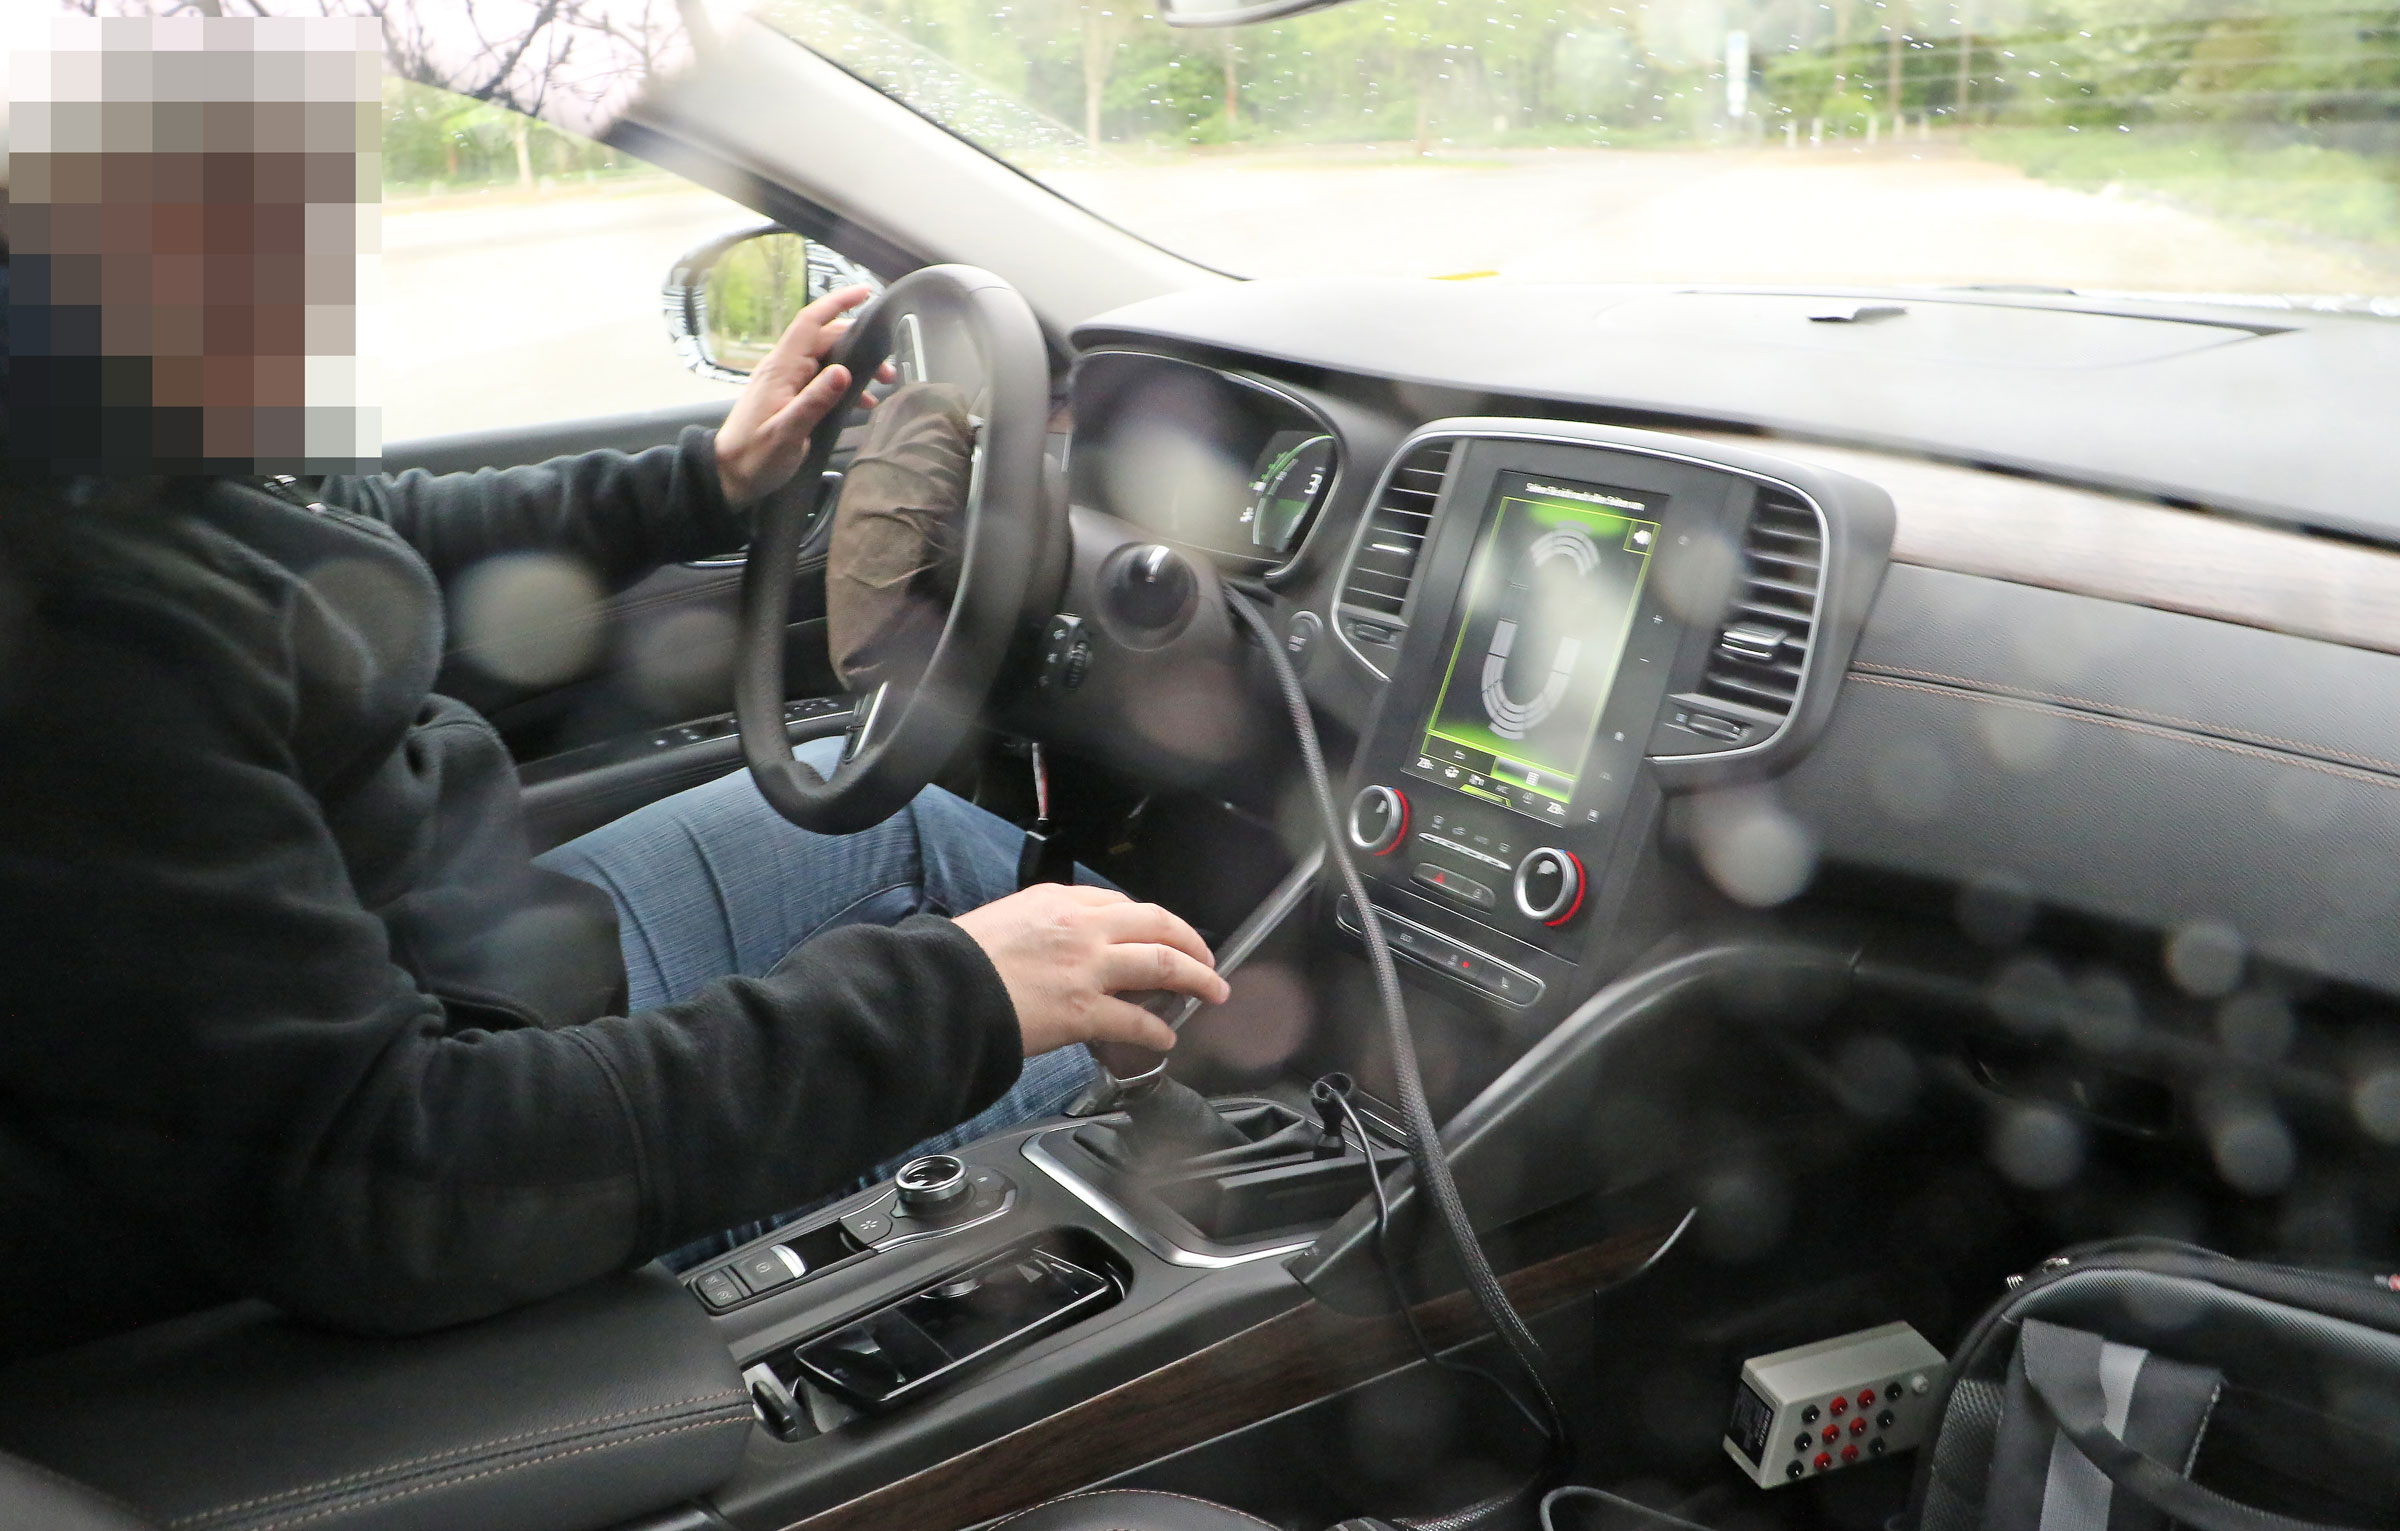 Renault Laguna spy